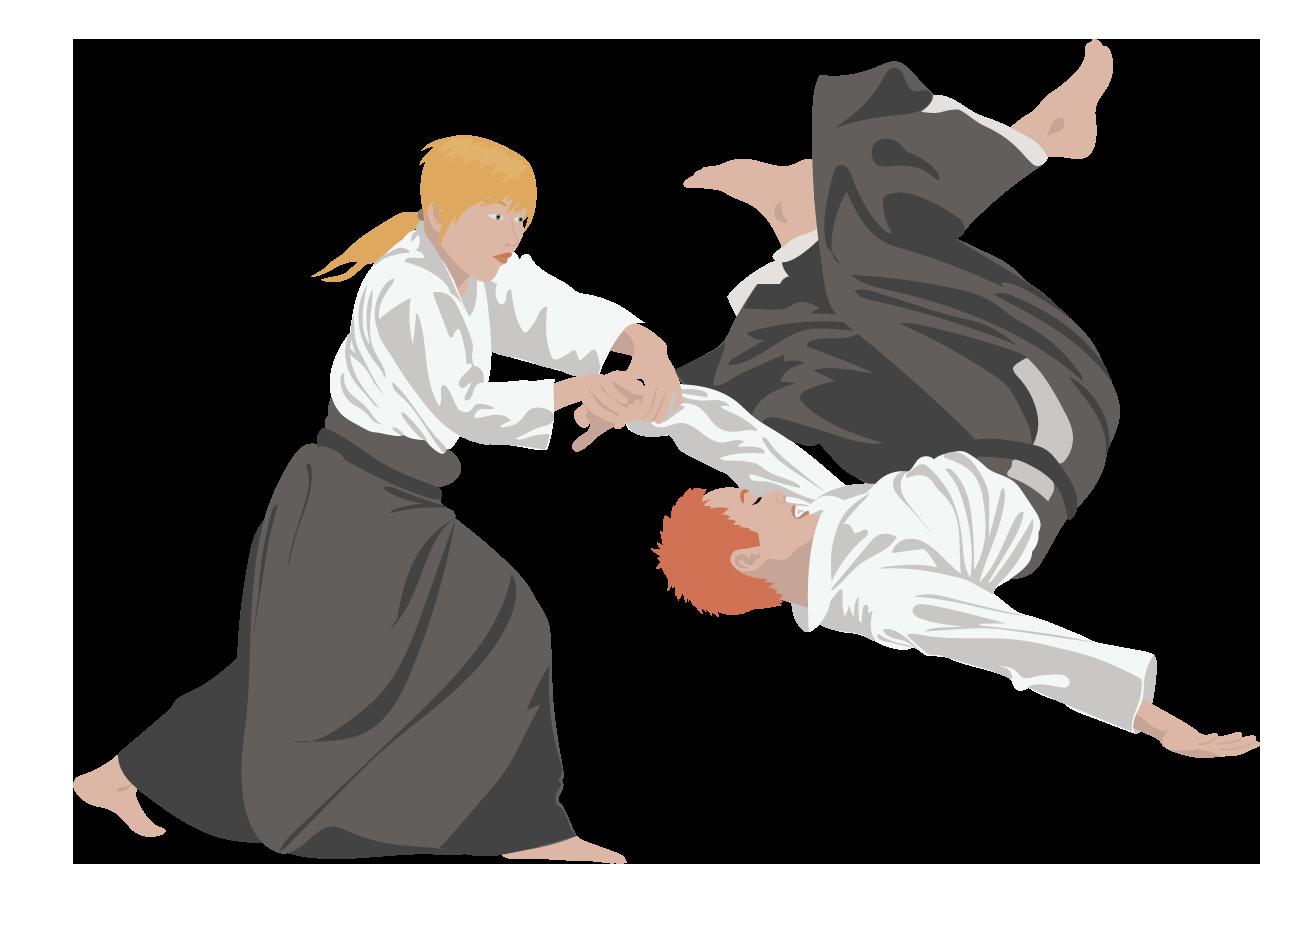 kampsport aikido